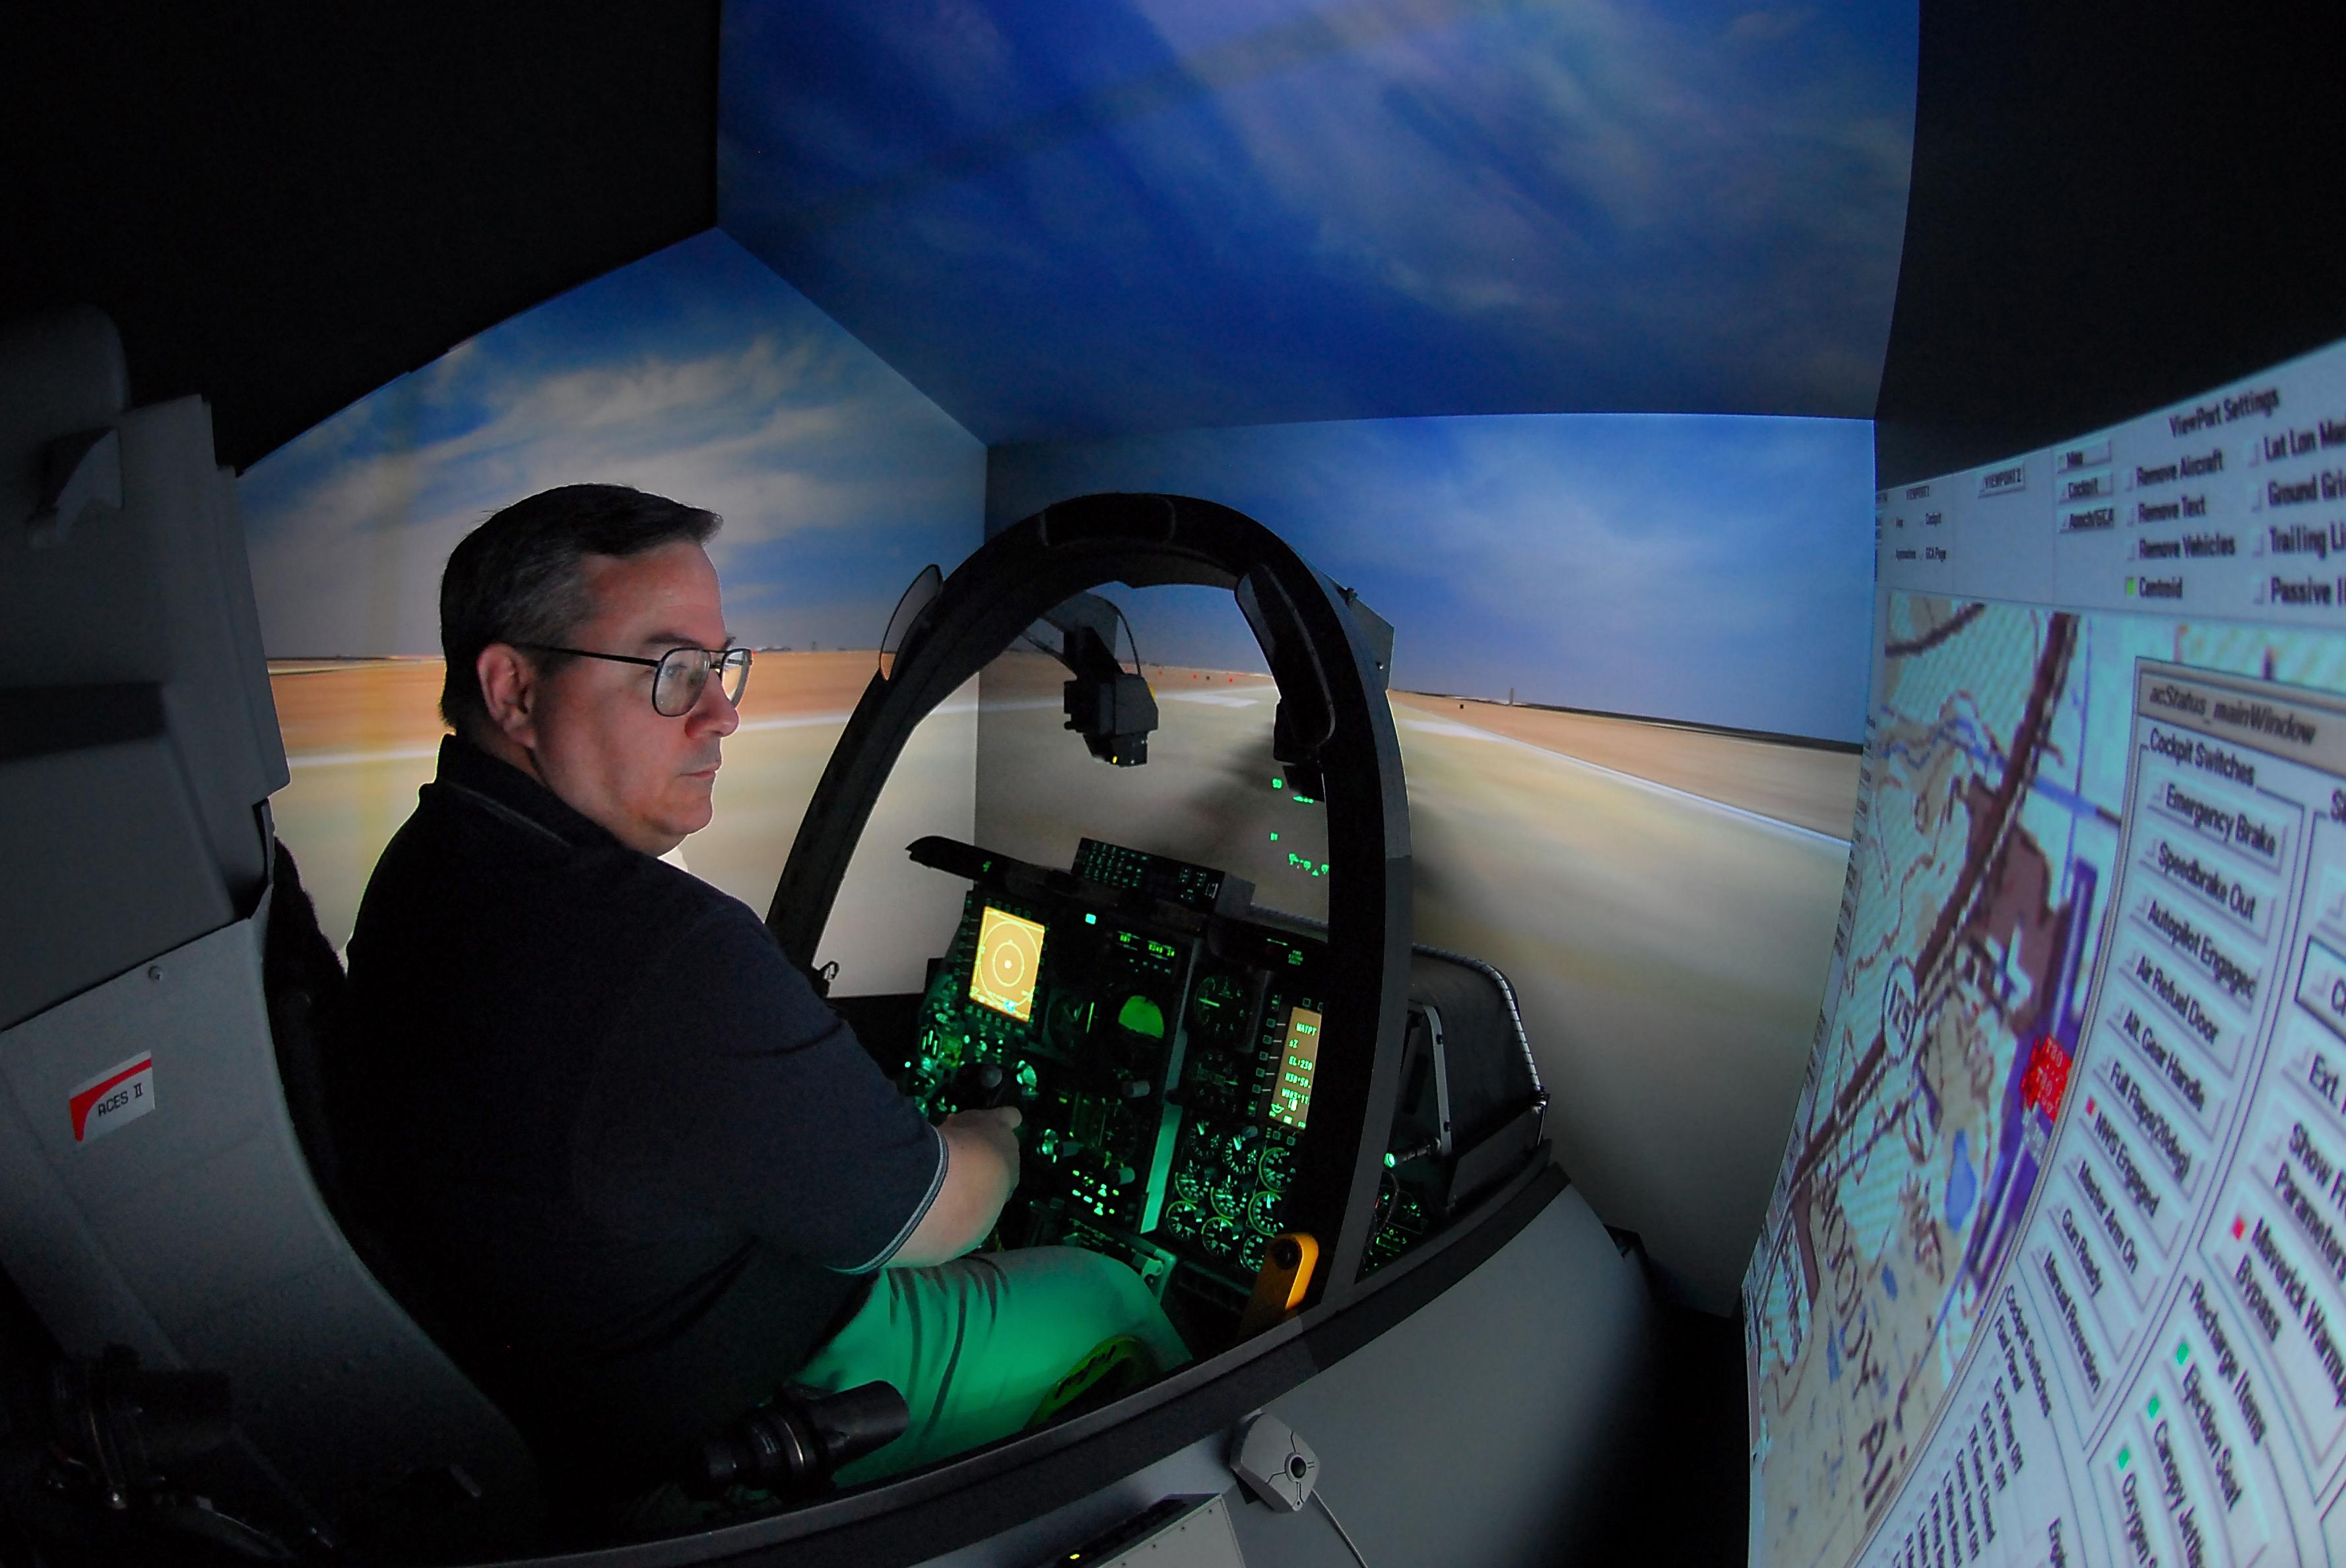 Virtual Hog' ready to put Moody's pilots under pressure > Moody Air